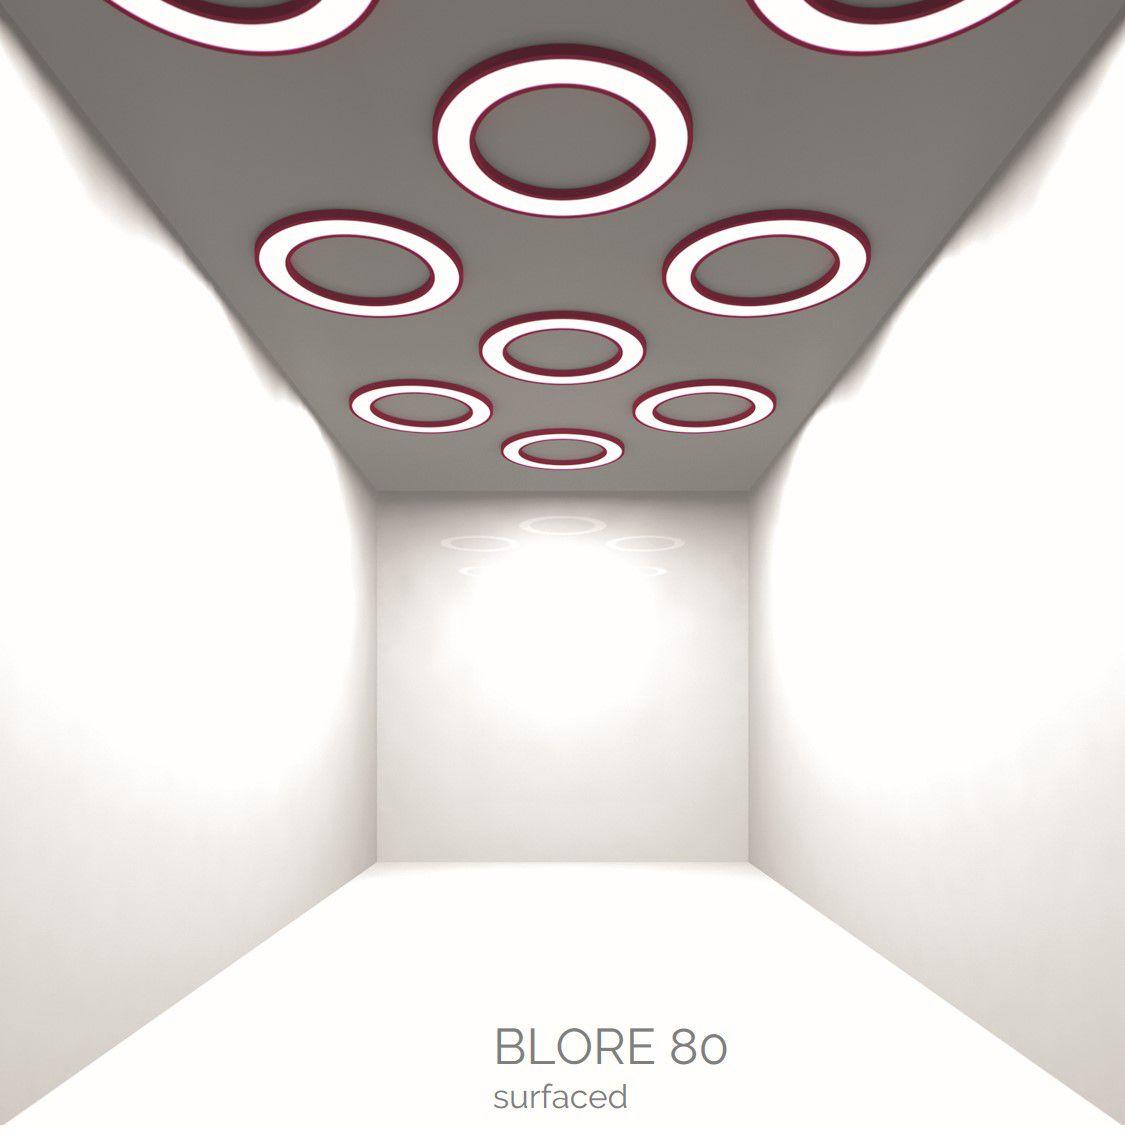 blore 80 surfaced luminaire round 1200x80mm 3000k 5943lm 70w fix